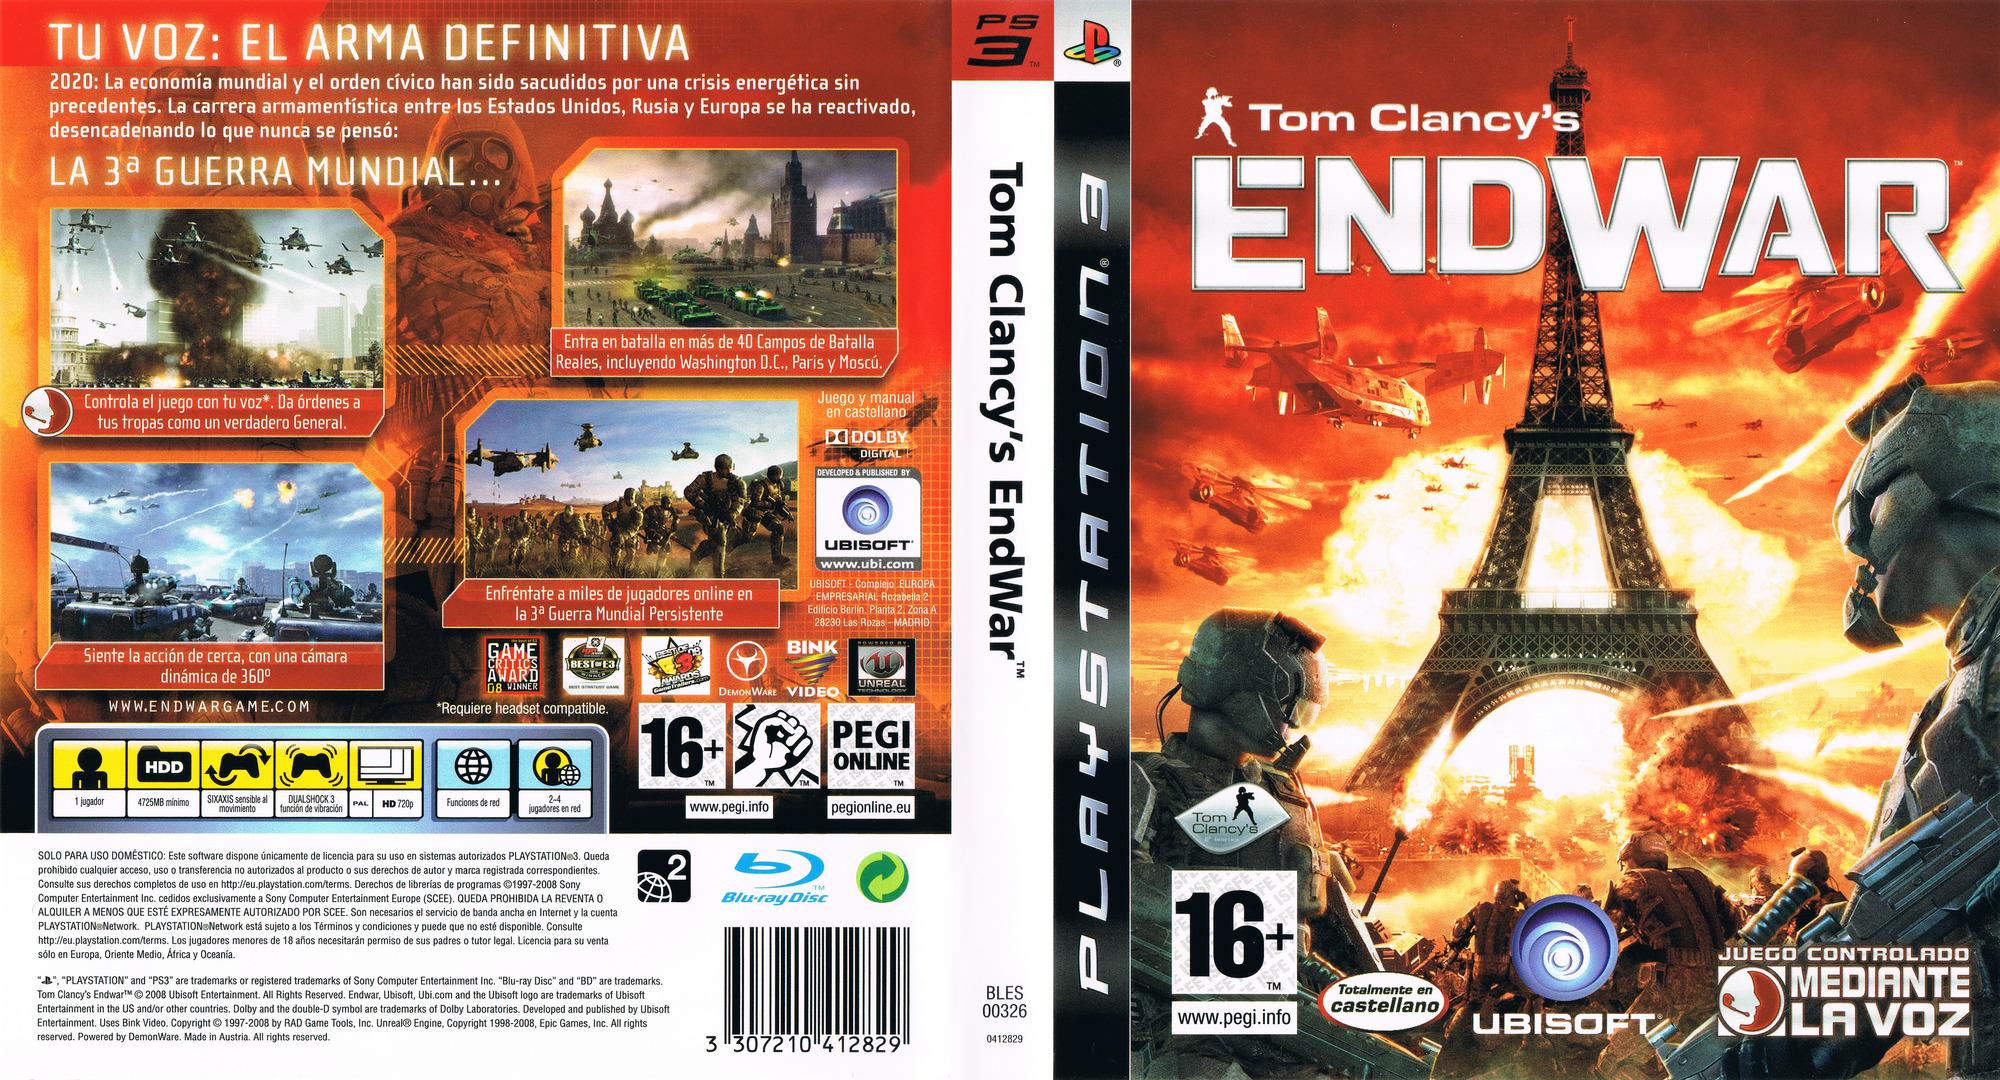 Tom Clancy's EndWar PS3 coverfullHQ (BLES00326)